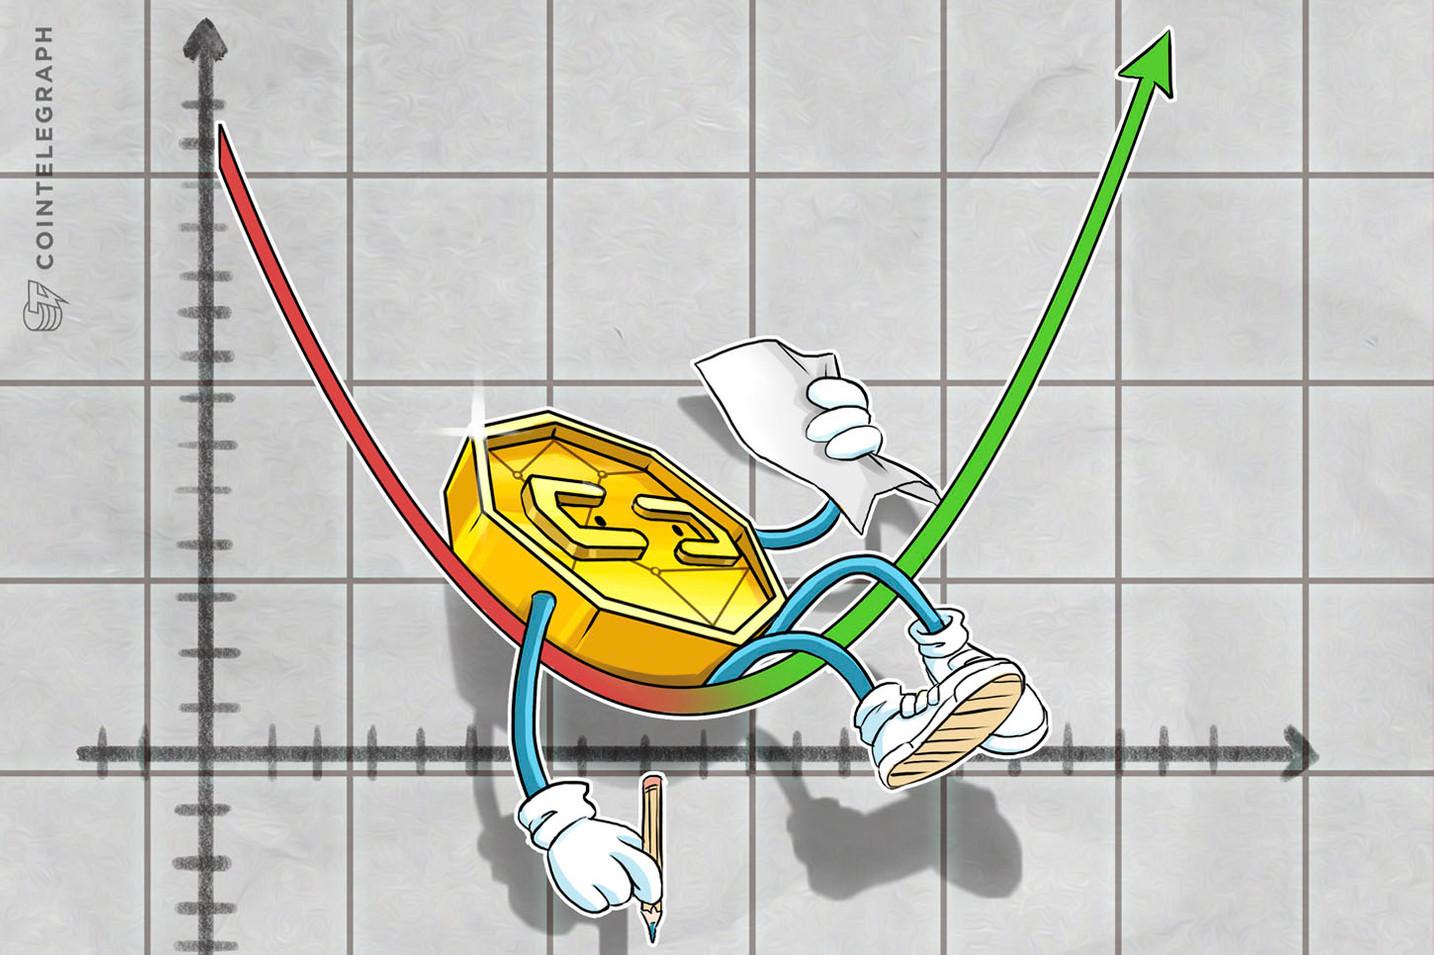 Bitcoin, Ethereum, Bitcoin Cash, Ripple, Stellar, Litecoin, Cardano, NEO, EOS: Price Analysis, April 21